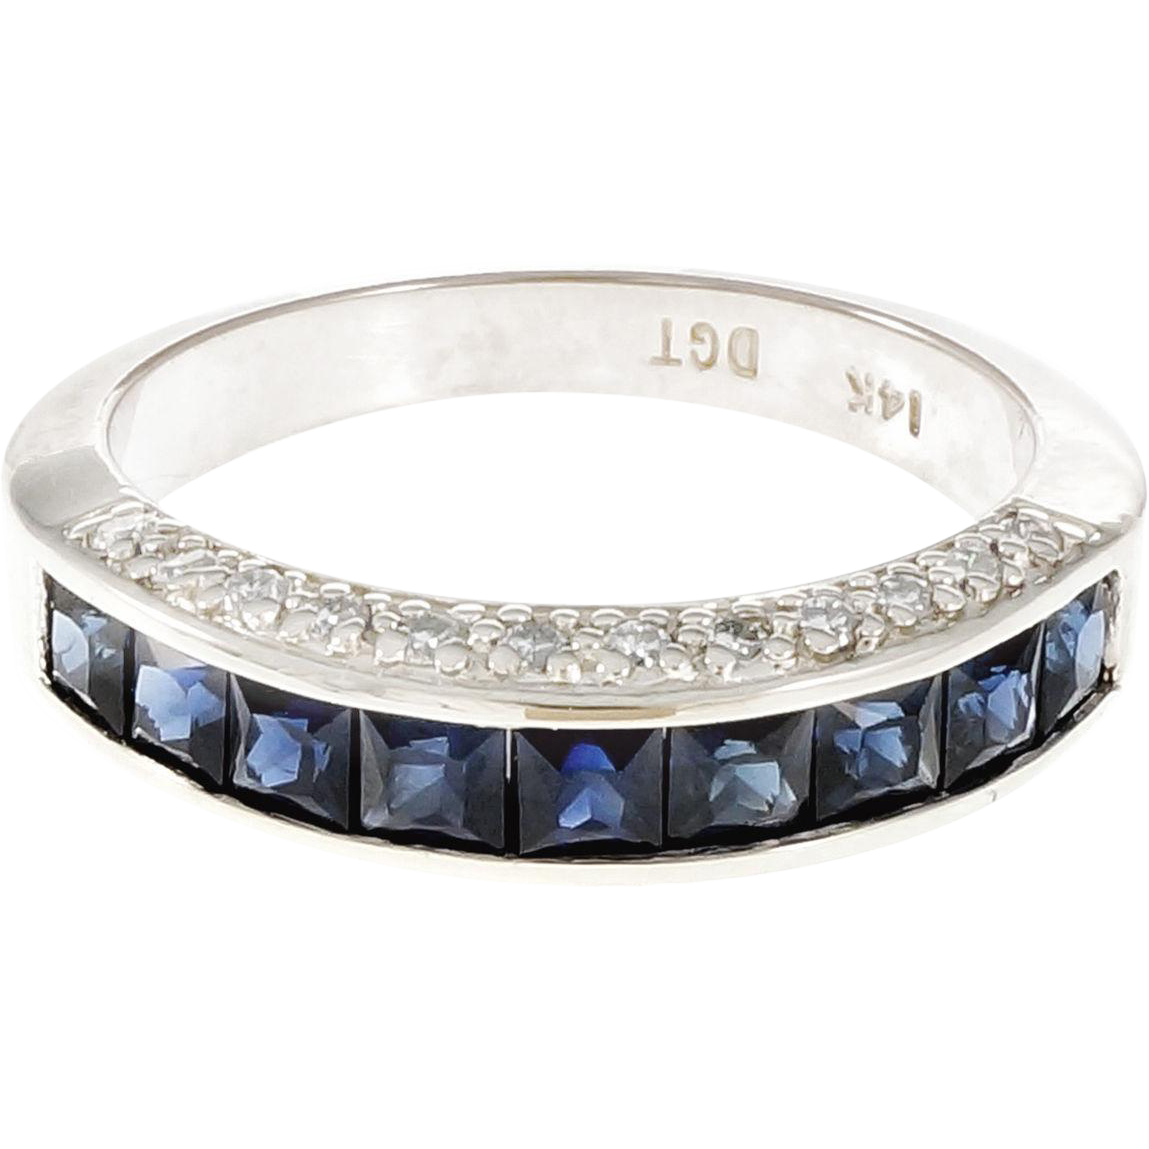 Square French Cut Sapphire 14 Karat  White Gold Diamond Wedding Band Ring